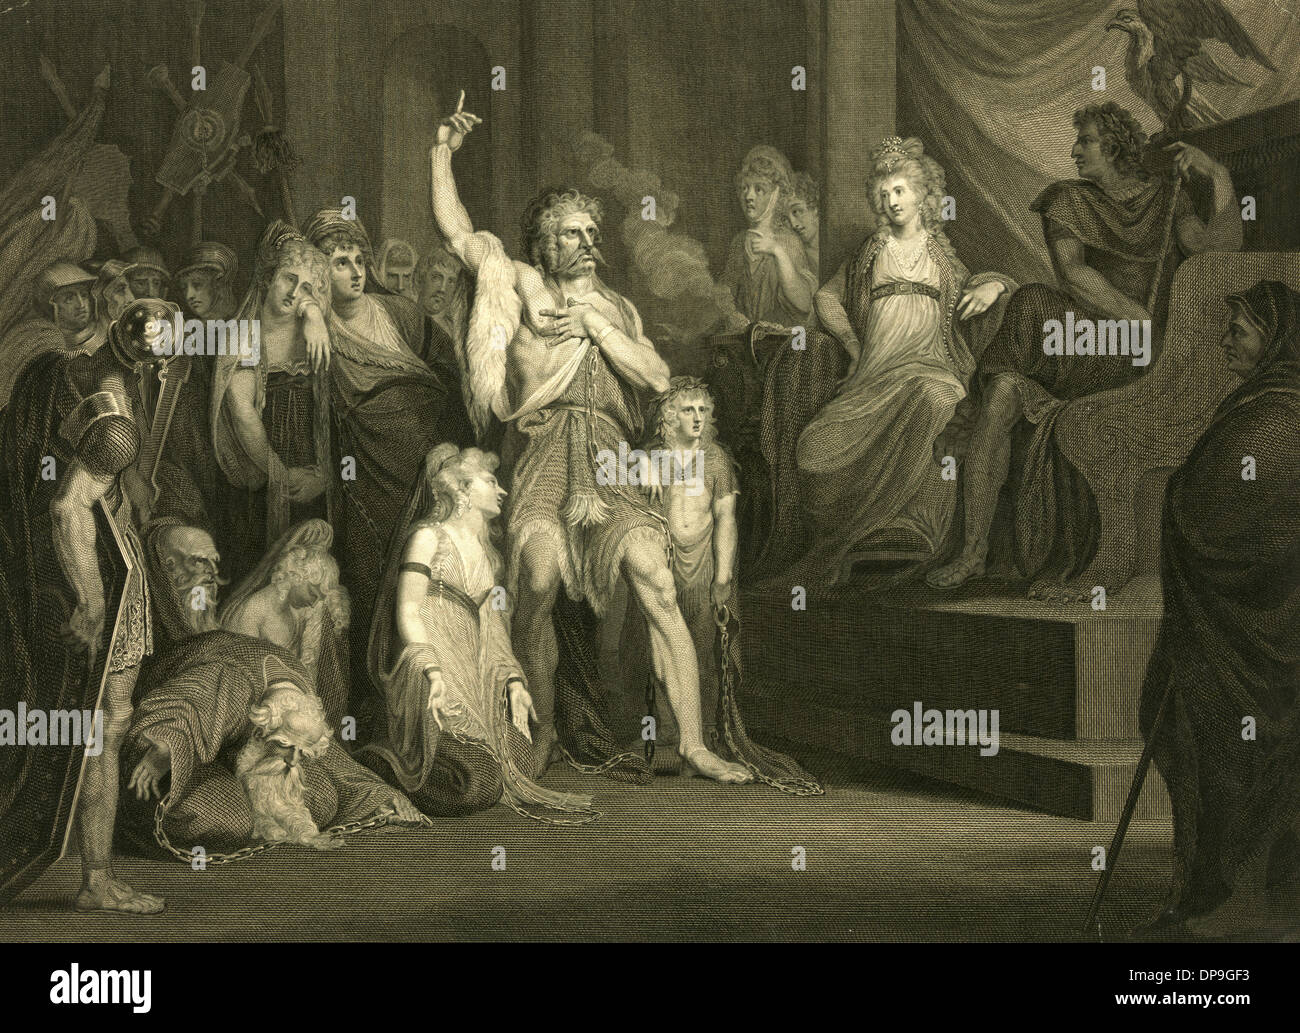 Caractacus at the Tribunal of Claudius at Rome - Stock Image